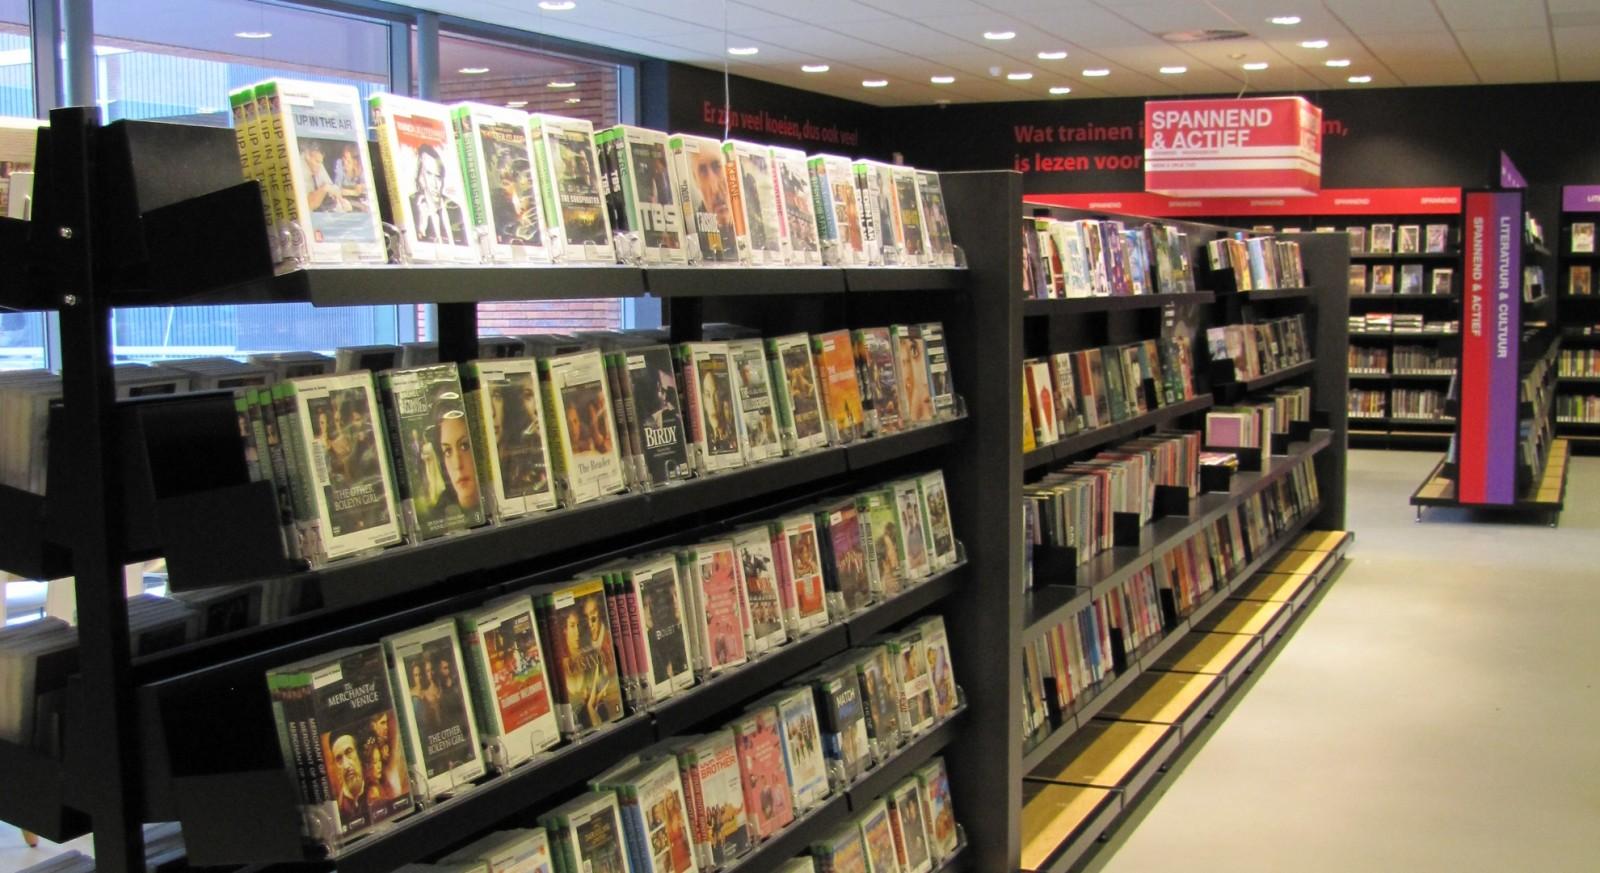 Bibliotheek Hilvarenbeek Elckerlyc